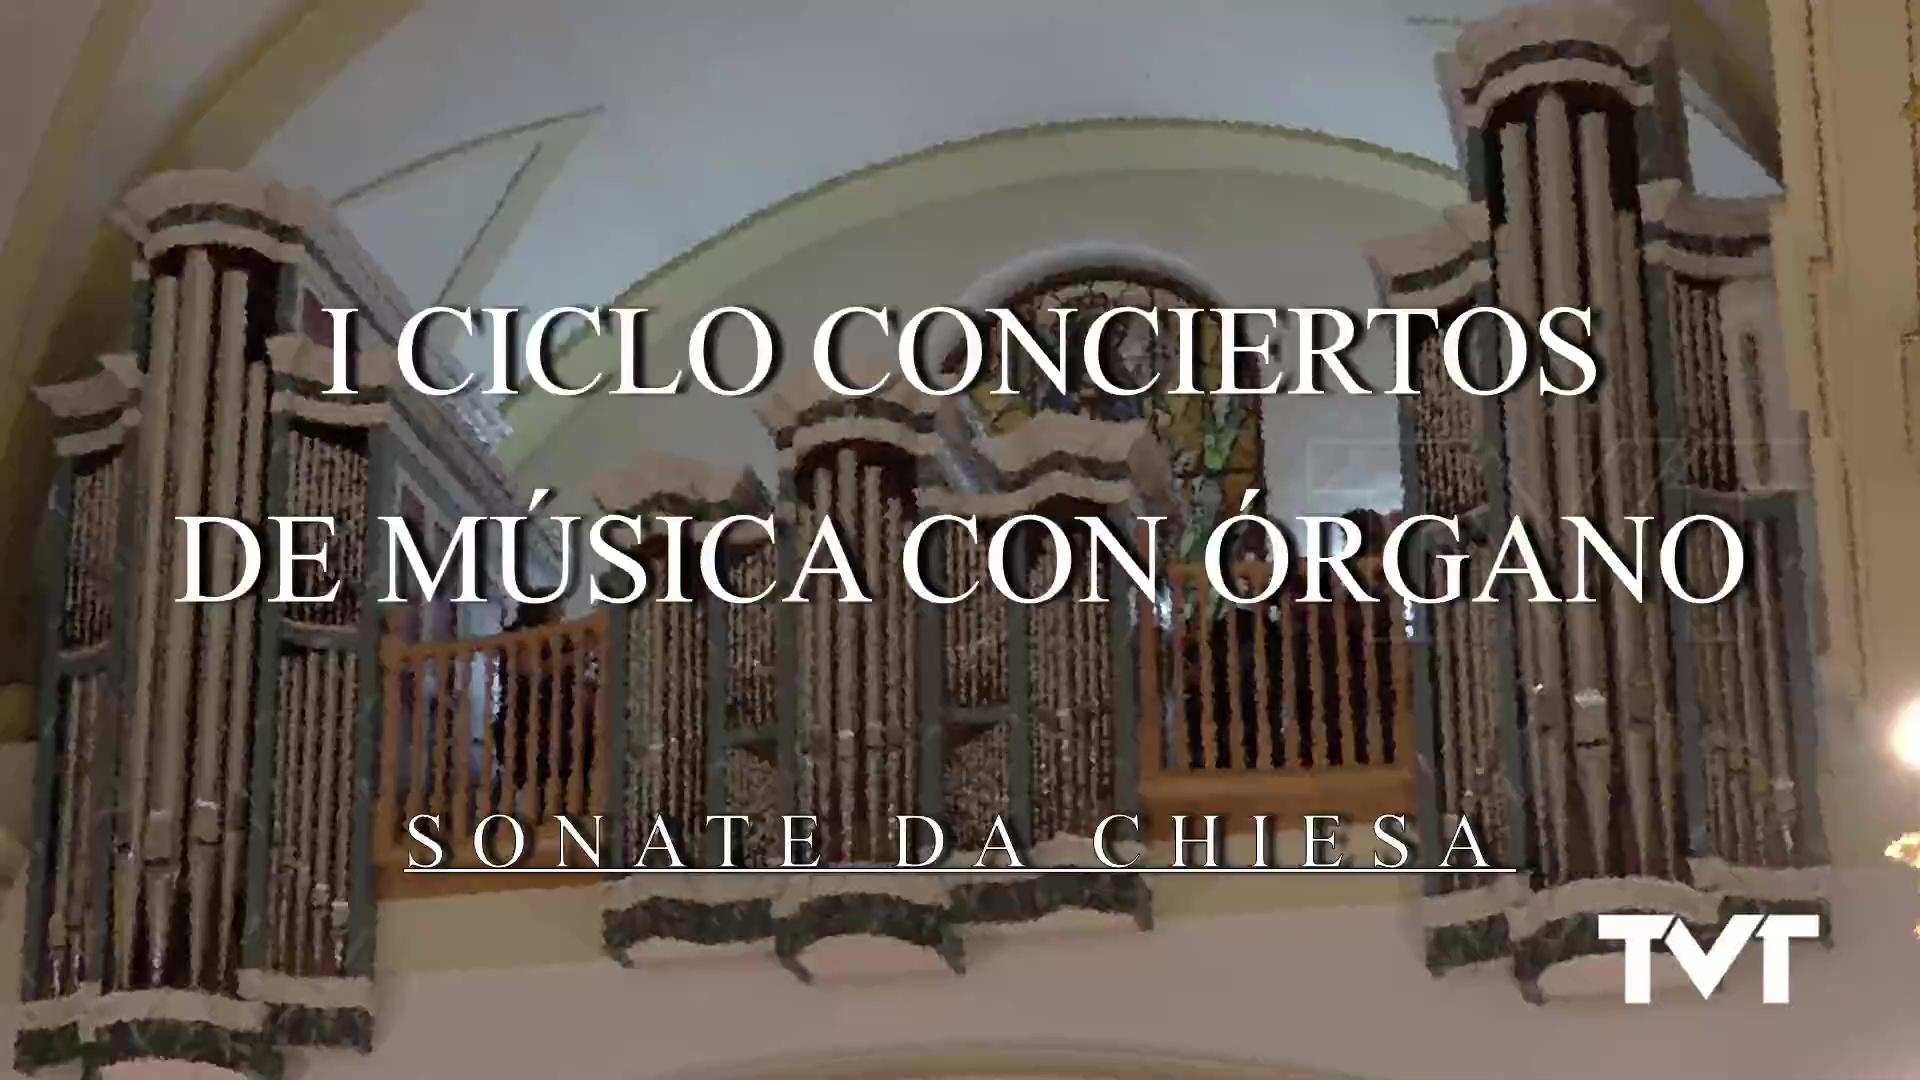 Concierto con Órgano Sonate da Chiesa